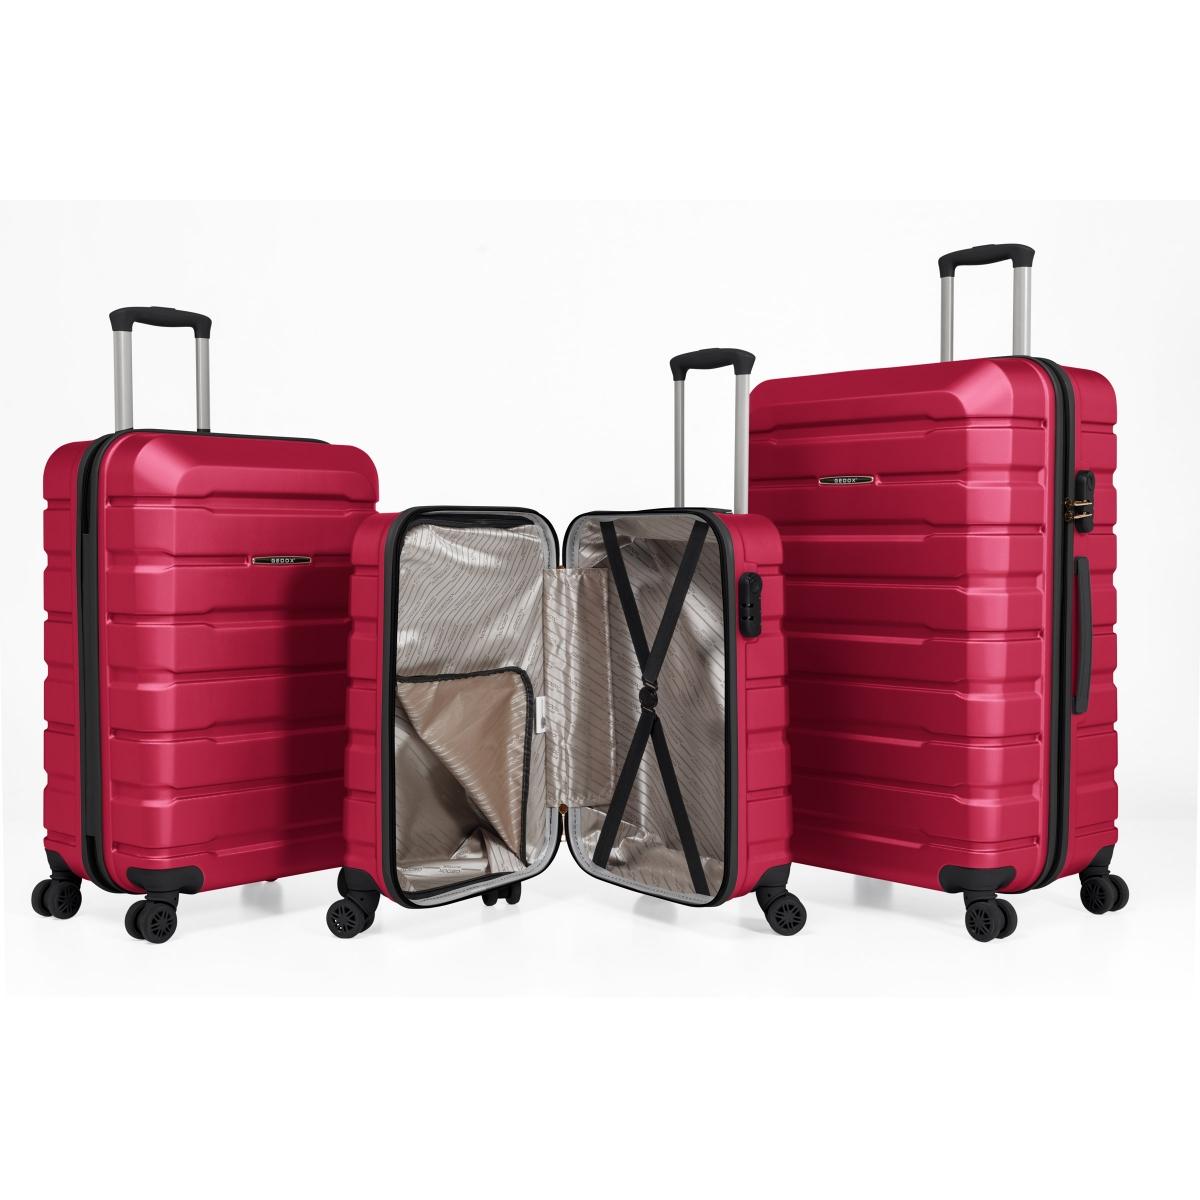 Gedox Abs Premium Tonaton 3'lü Valiz Seyahat Seti - Model:500.10 Fuşya Pembe